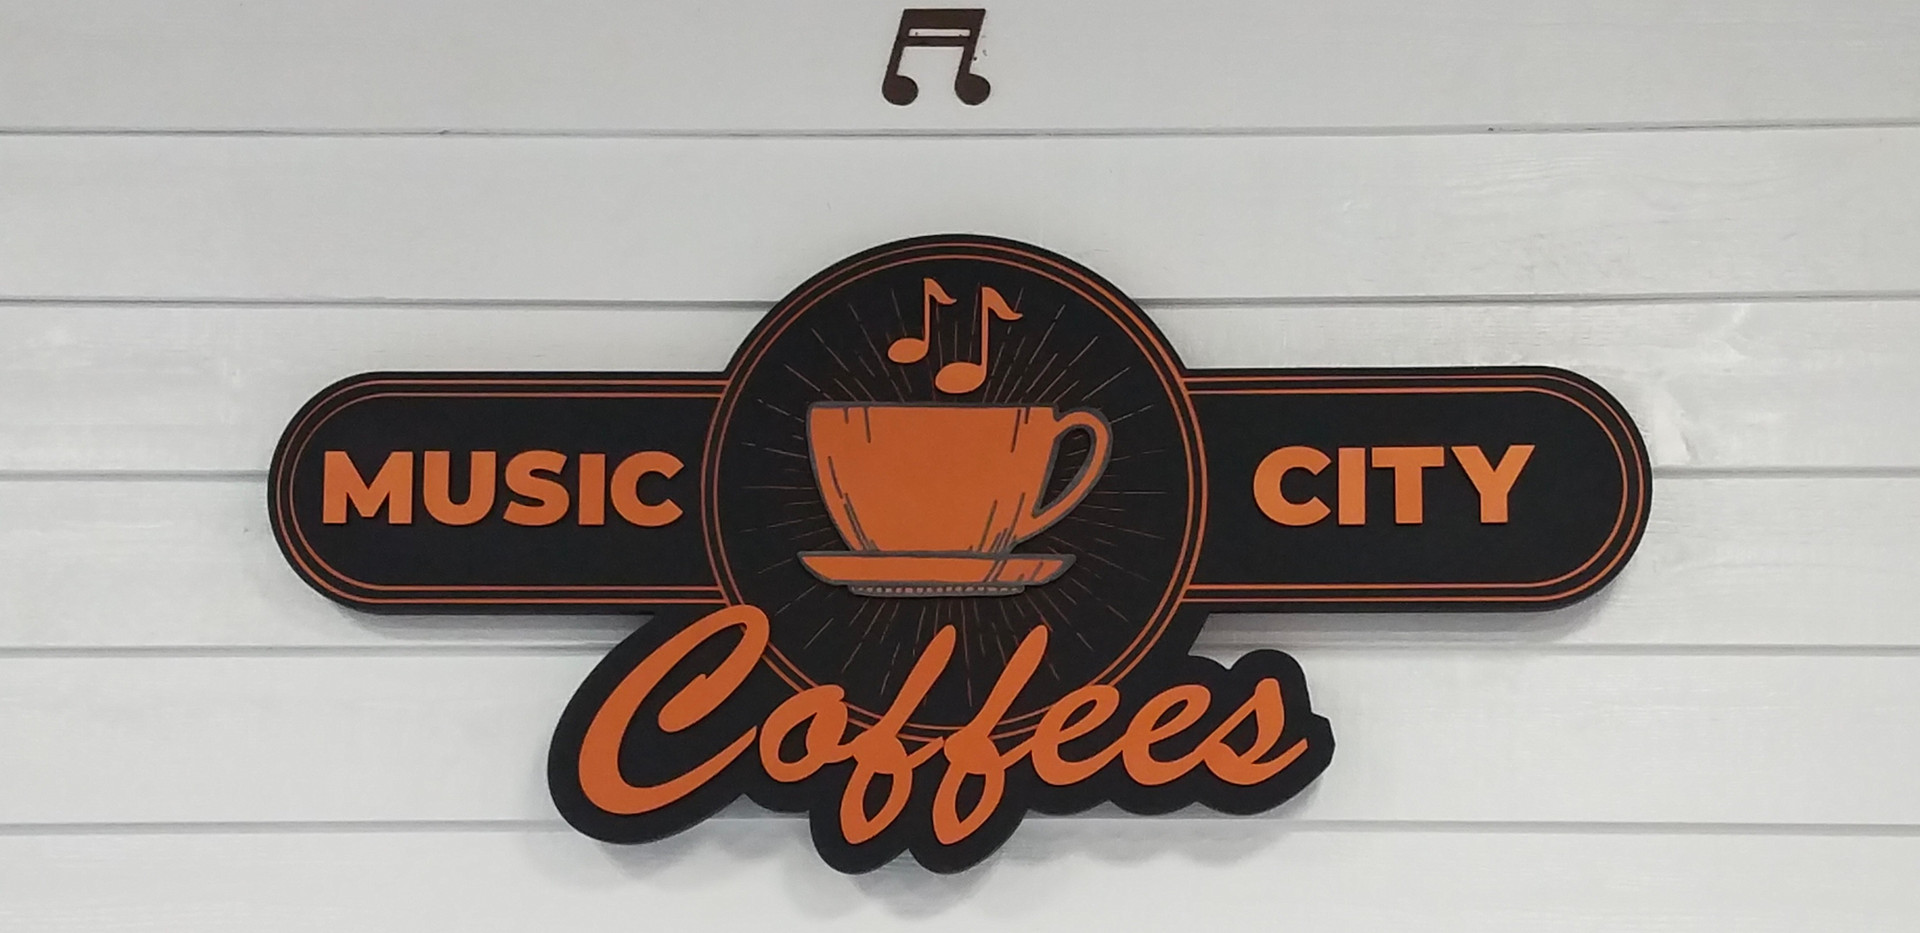 Music City Coffees, TN